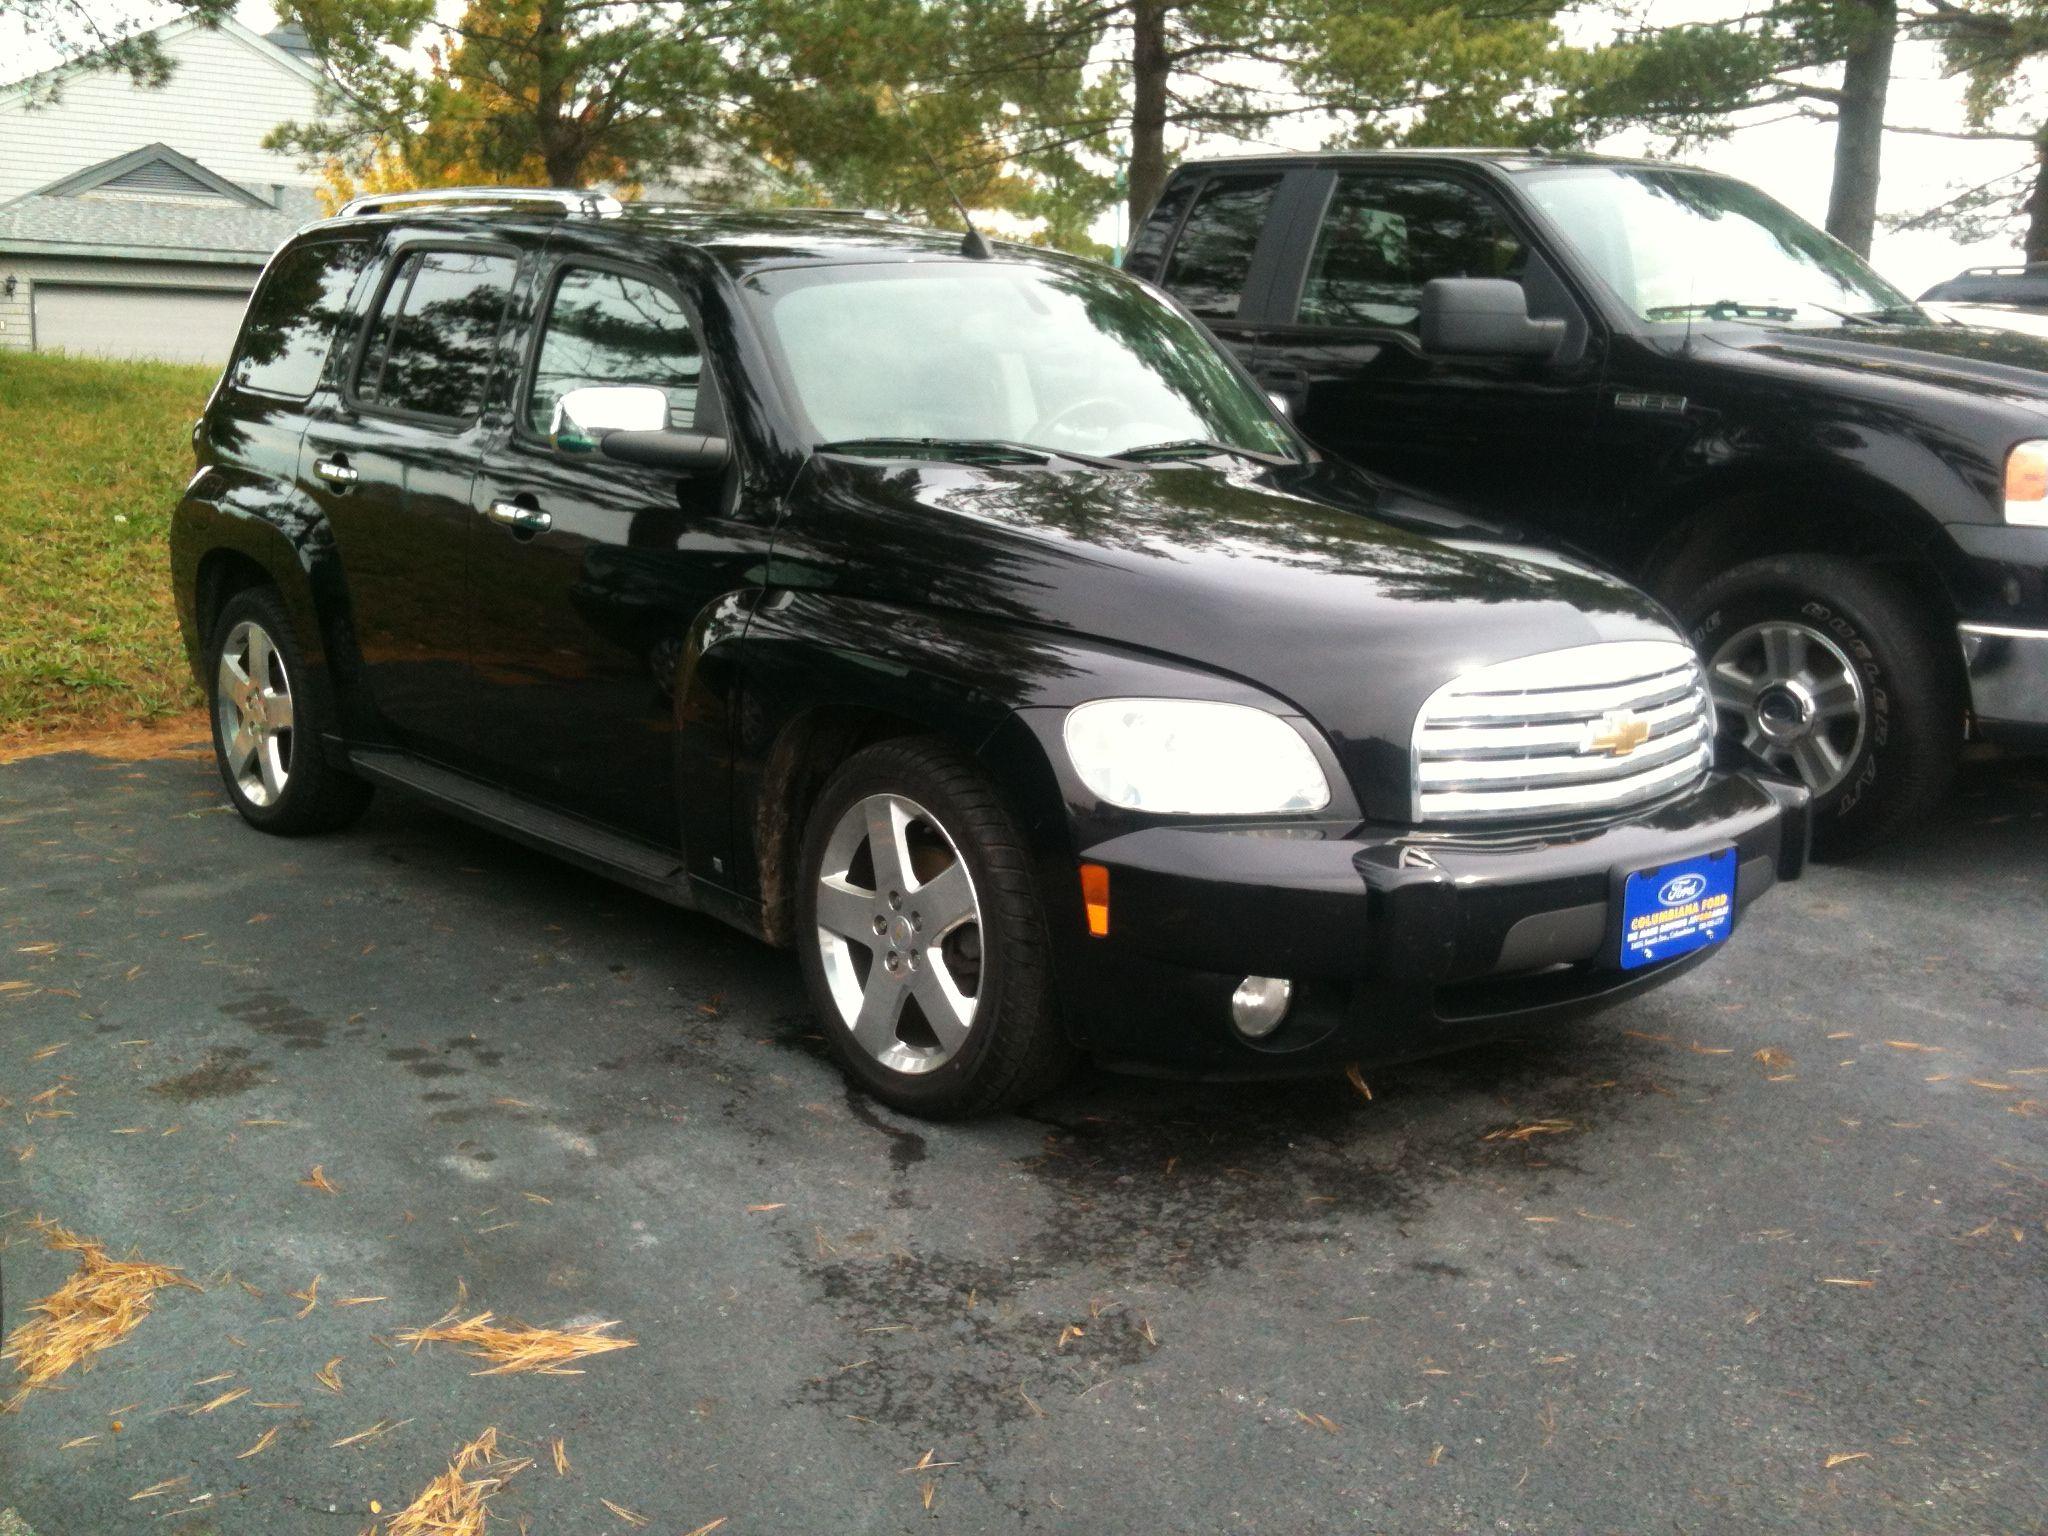 2006 Chevrolet Hhr Lt 8 988 Columbiana Ford 1 866 980 1216 Chevrolet Ford Car